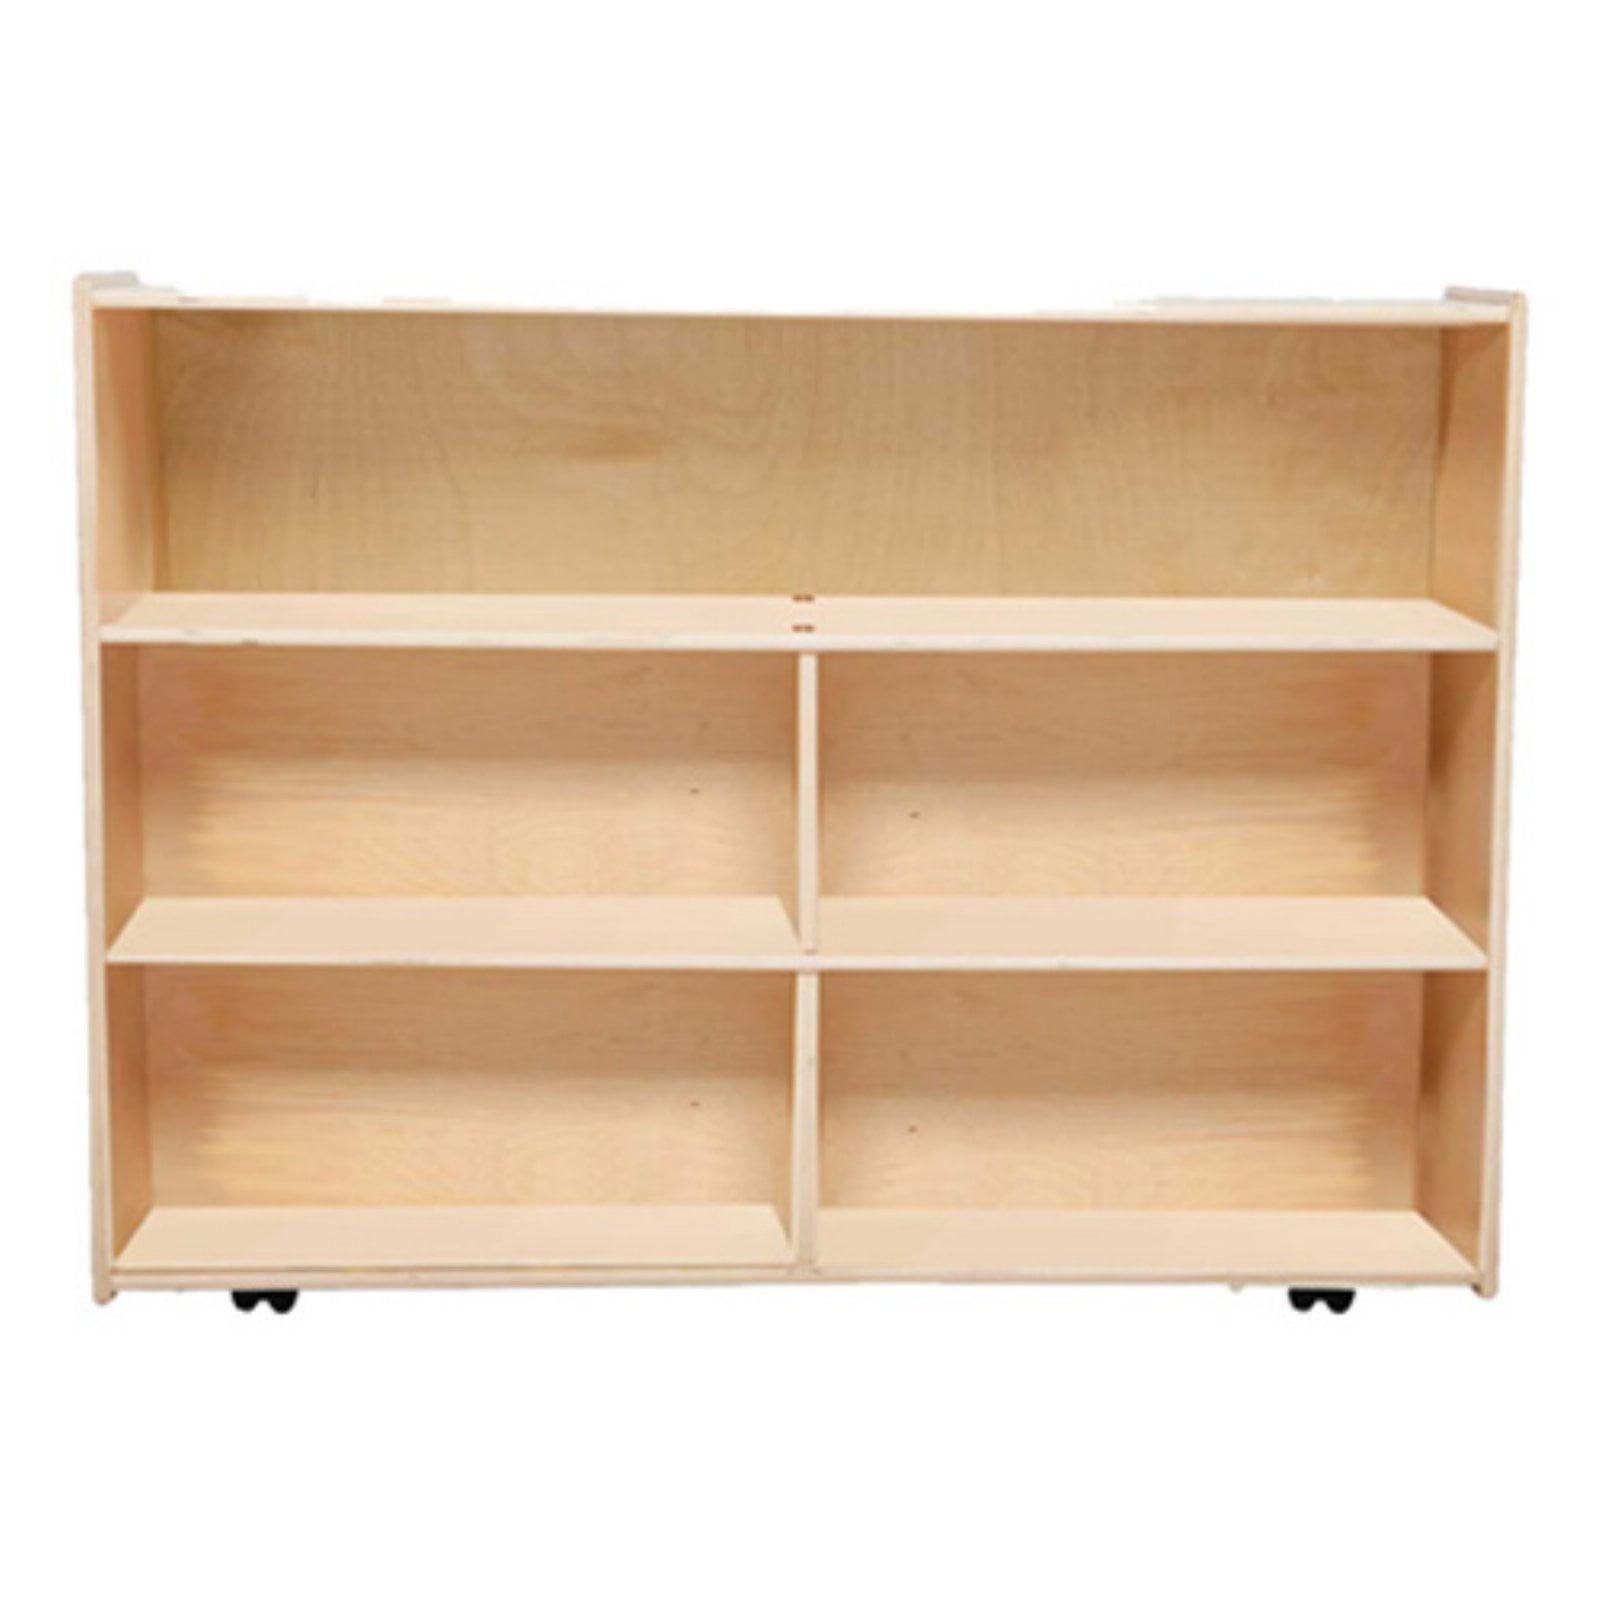 Wood Designs Contender Versatile Mobile Single Storage Unit